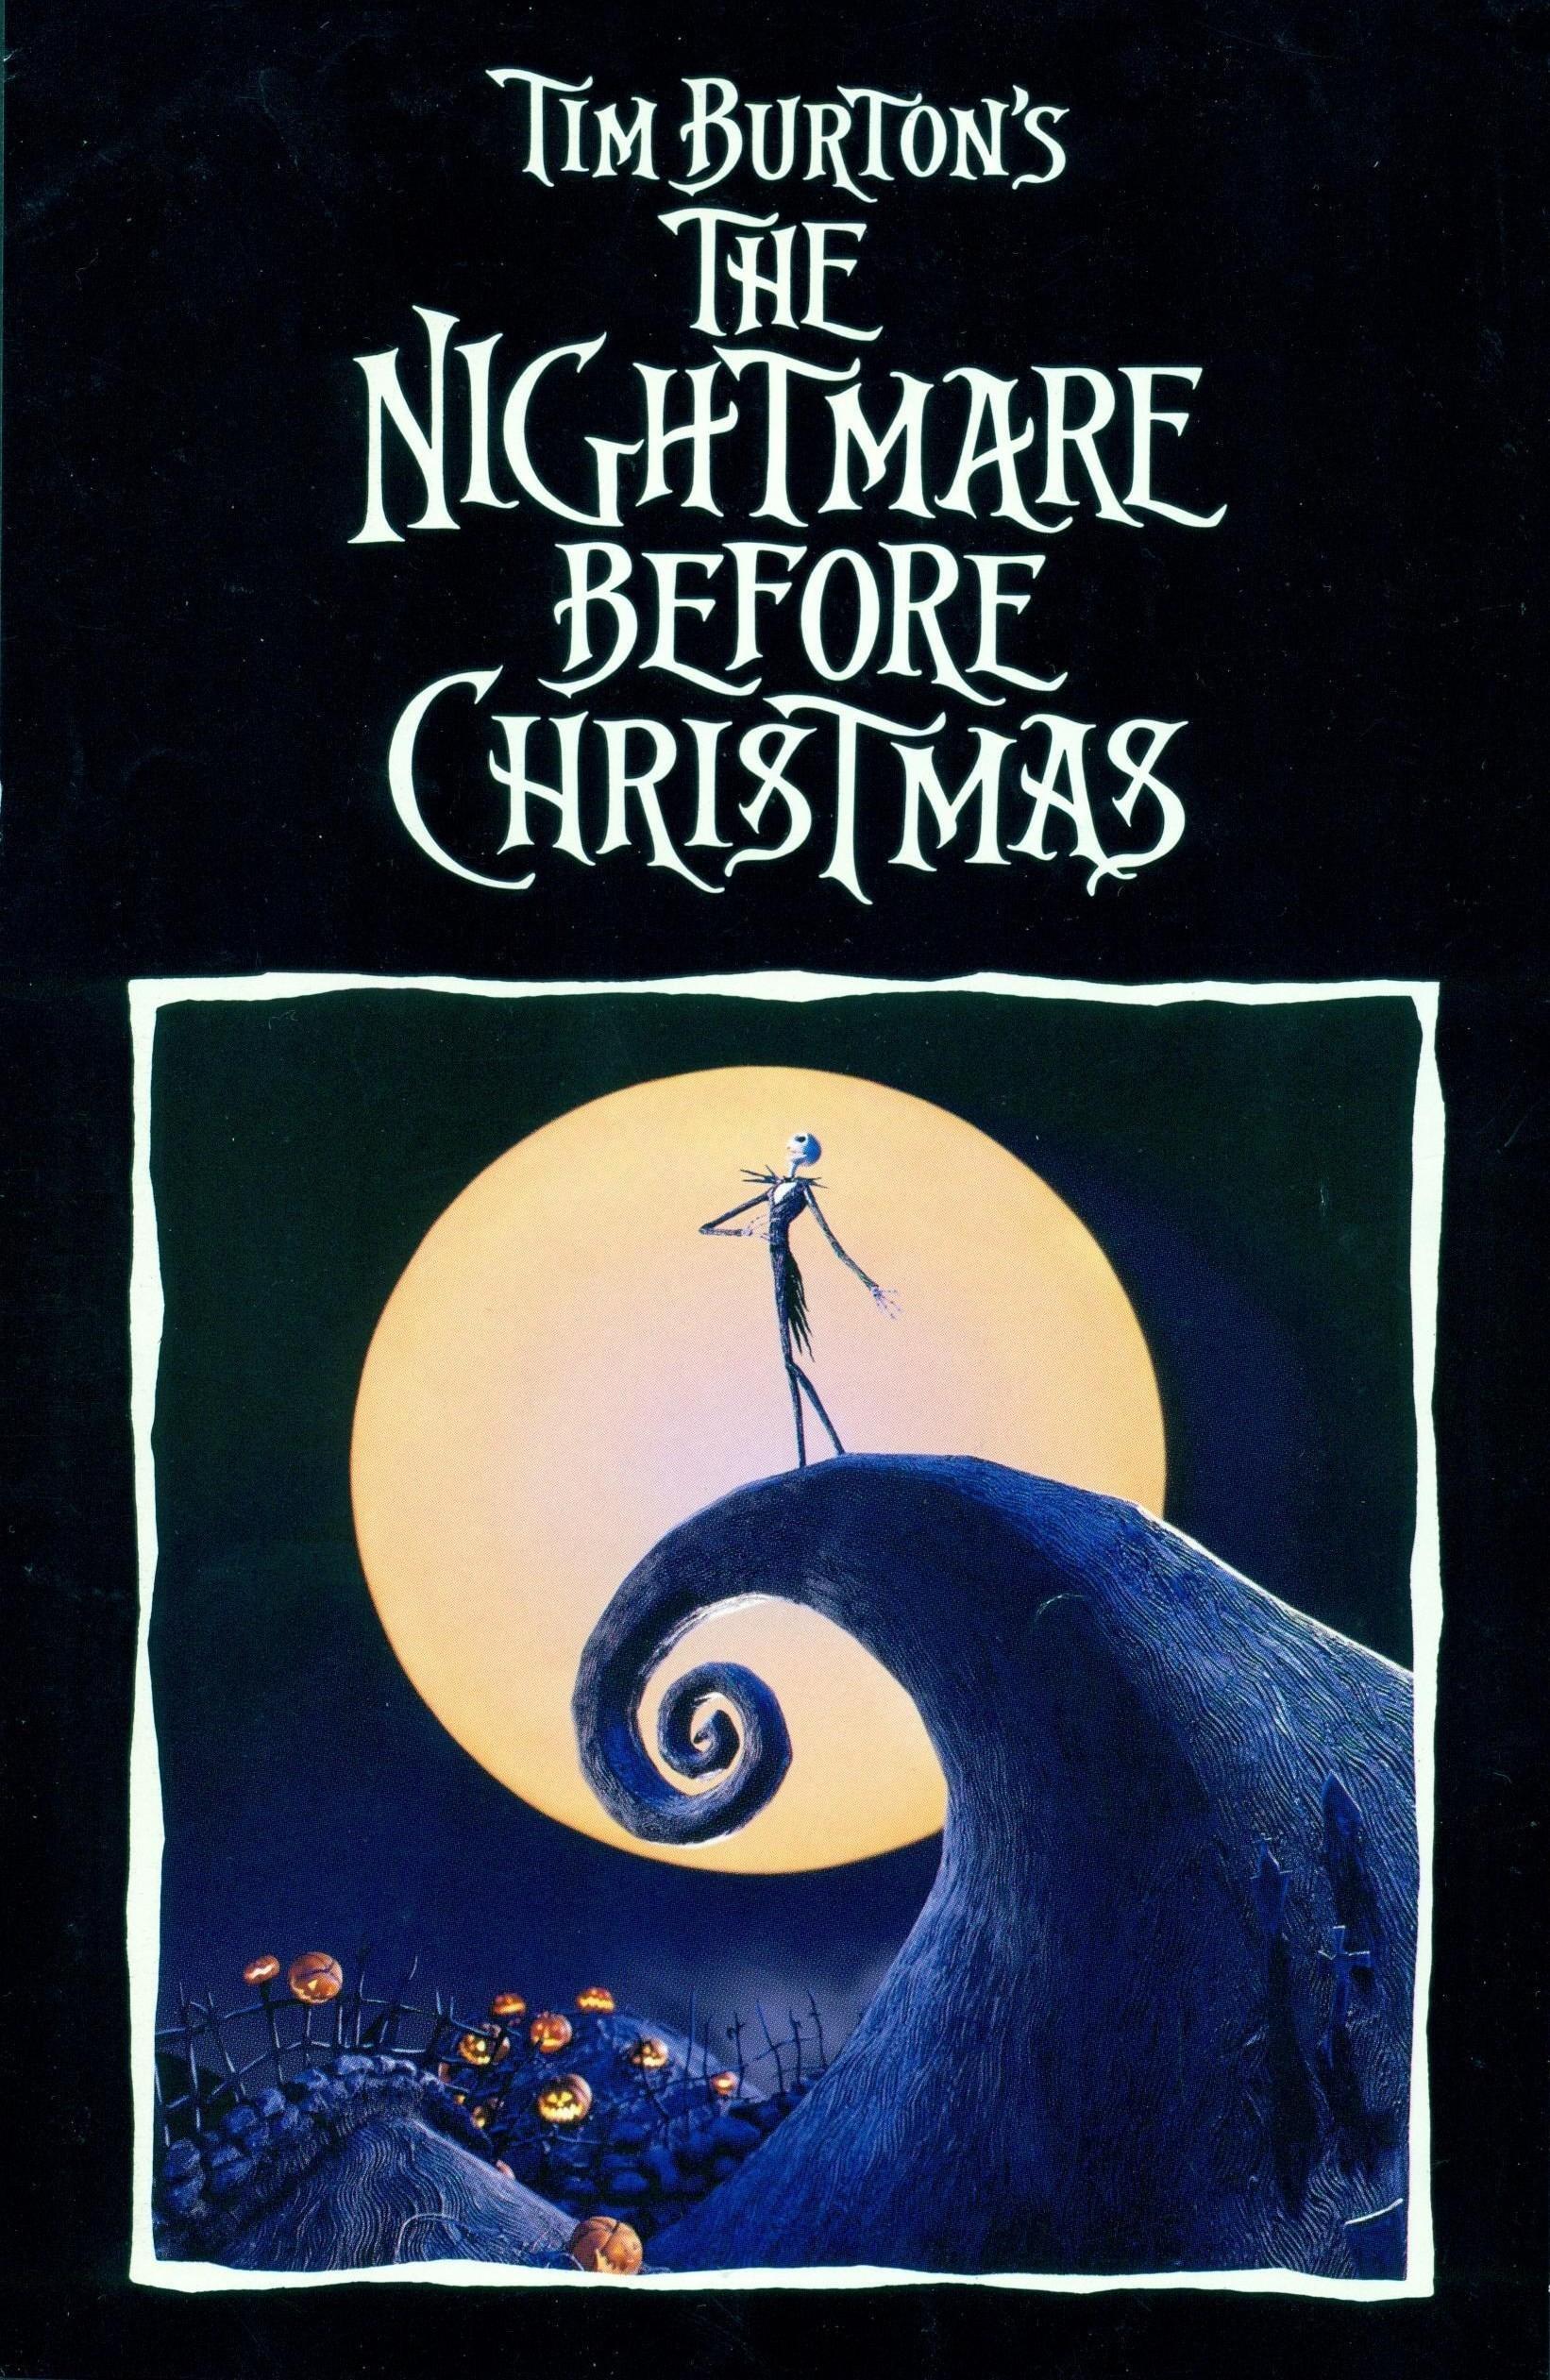 Nightmare-Art-nightmare-before-christmas-21692098-1642-2521